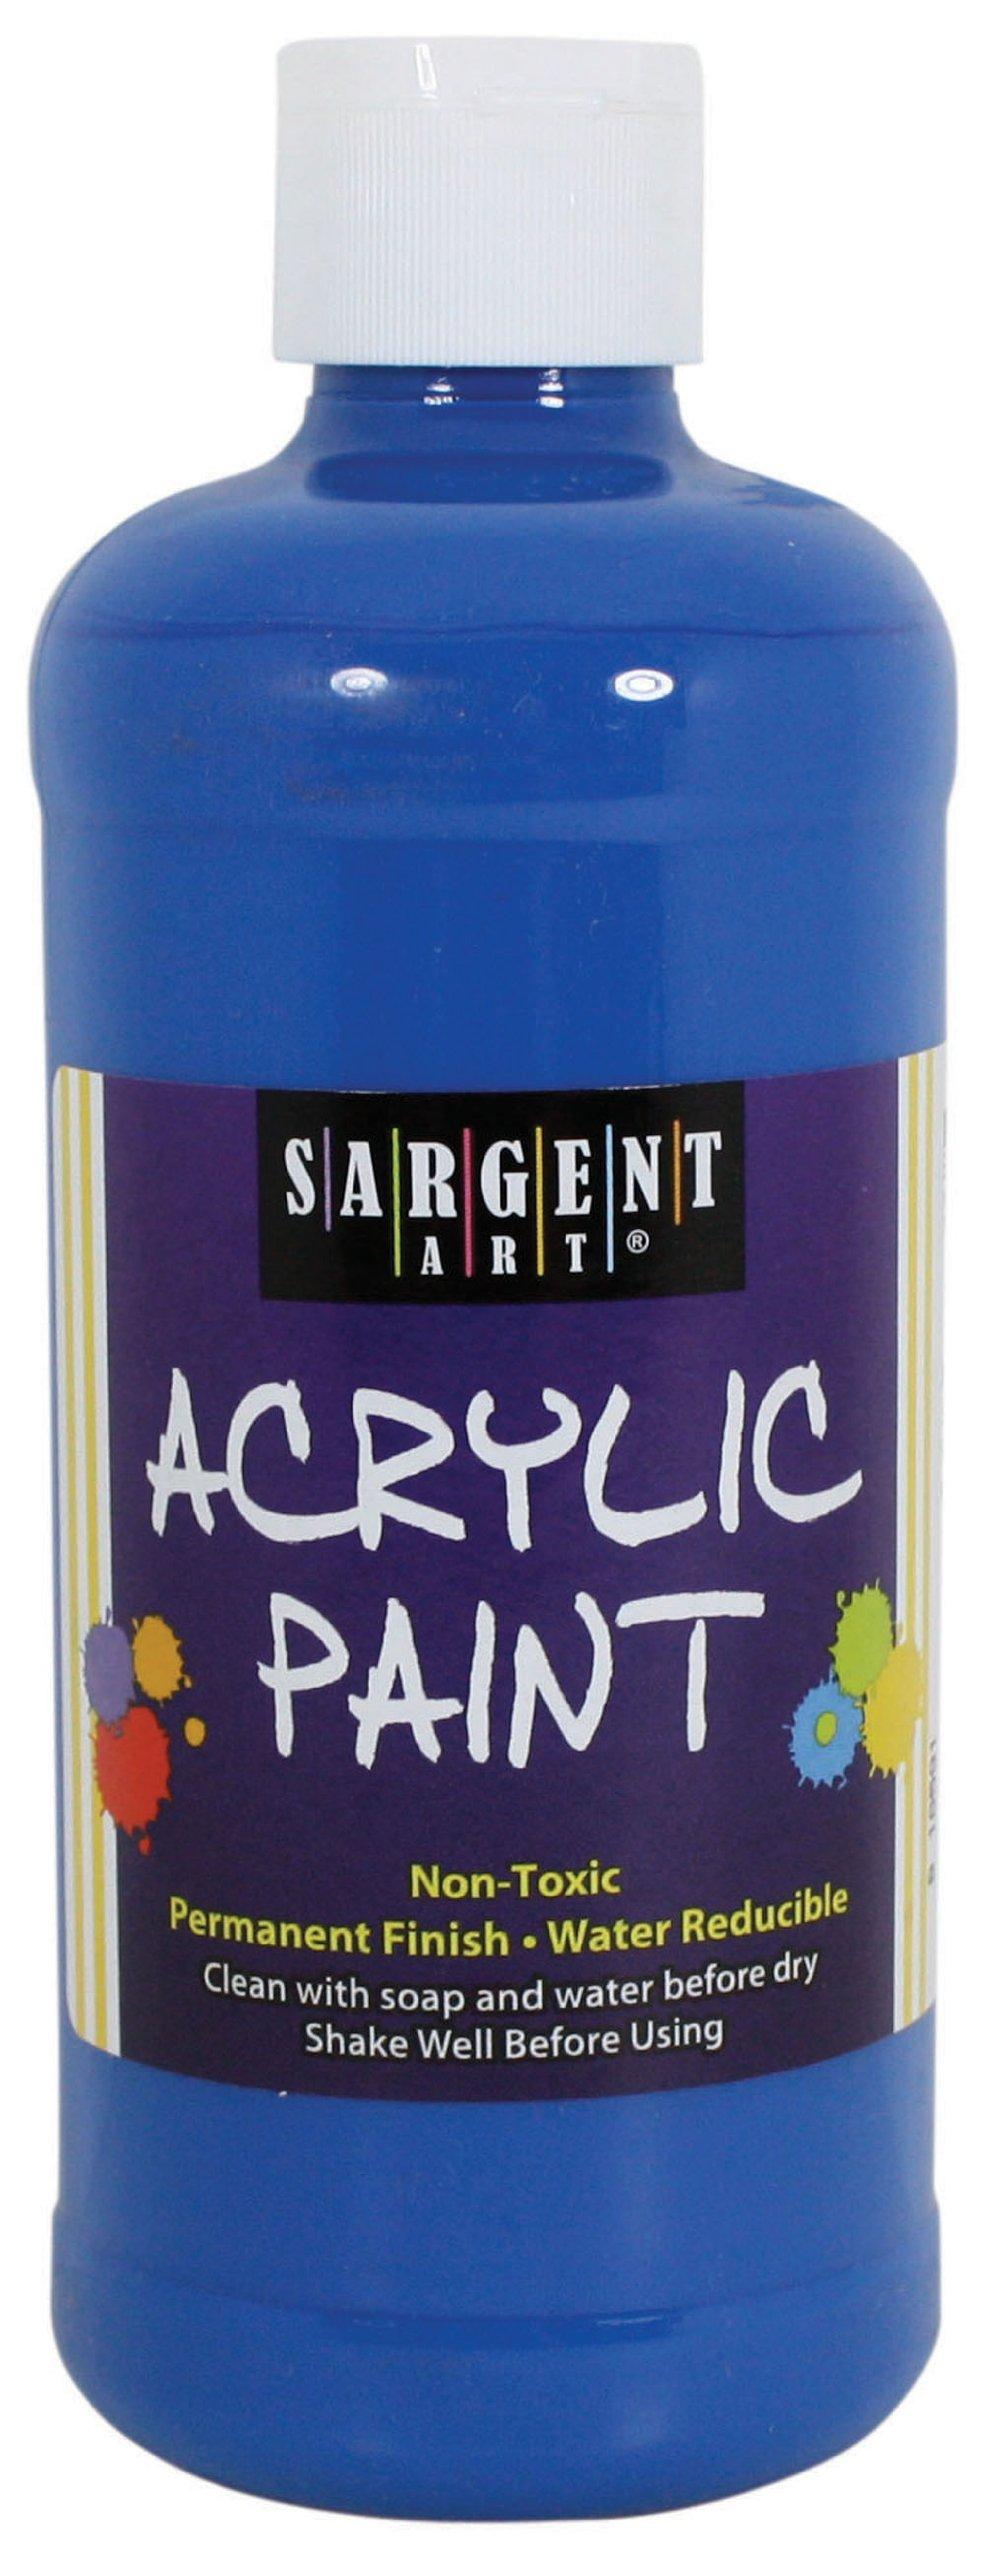 Sargent Art 24-2455 16-Ounce Acrylic Paint, Phthalo Blue